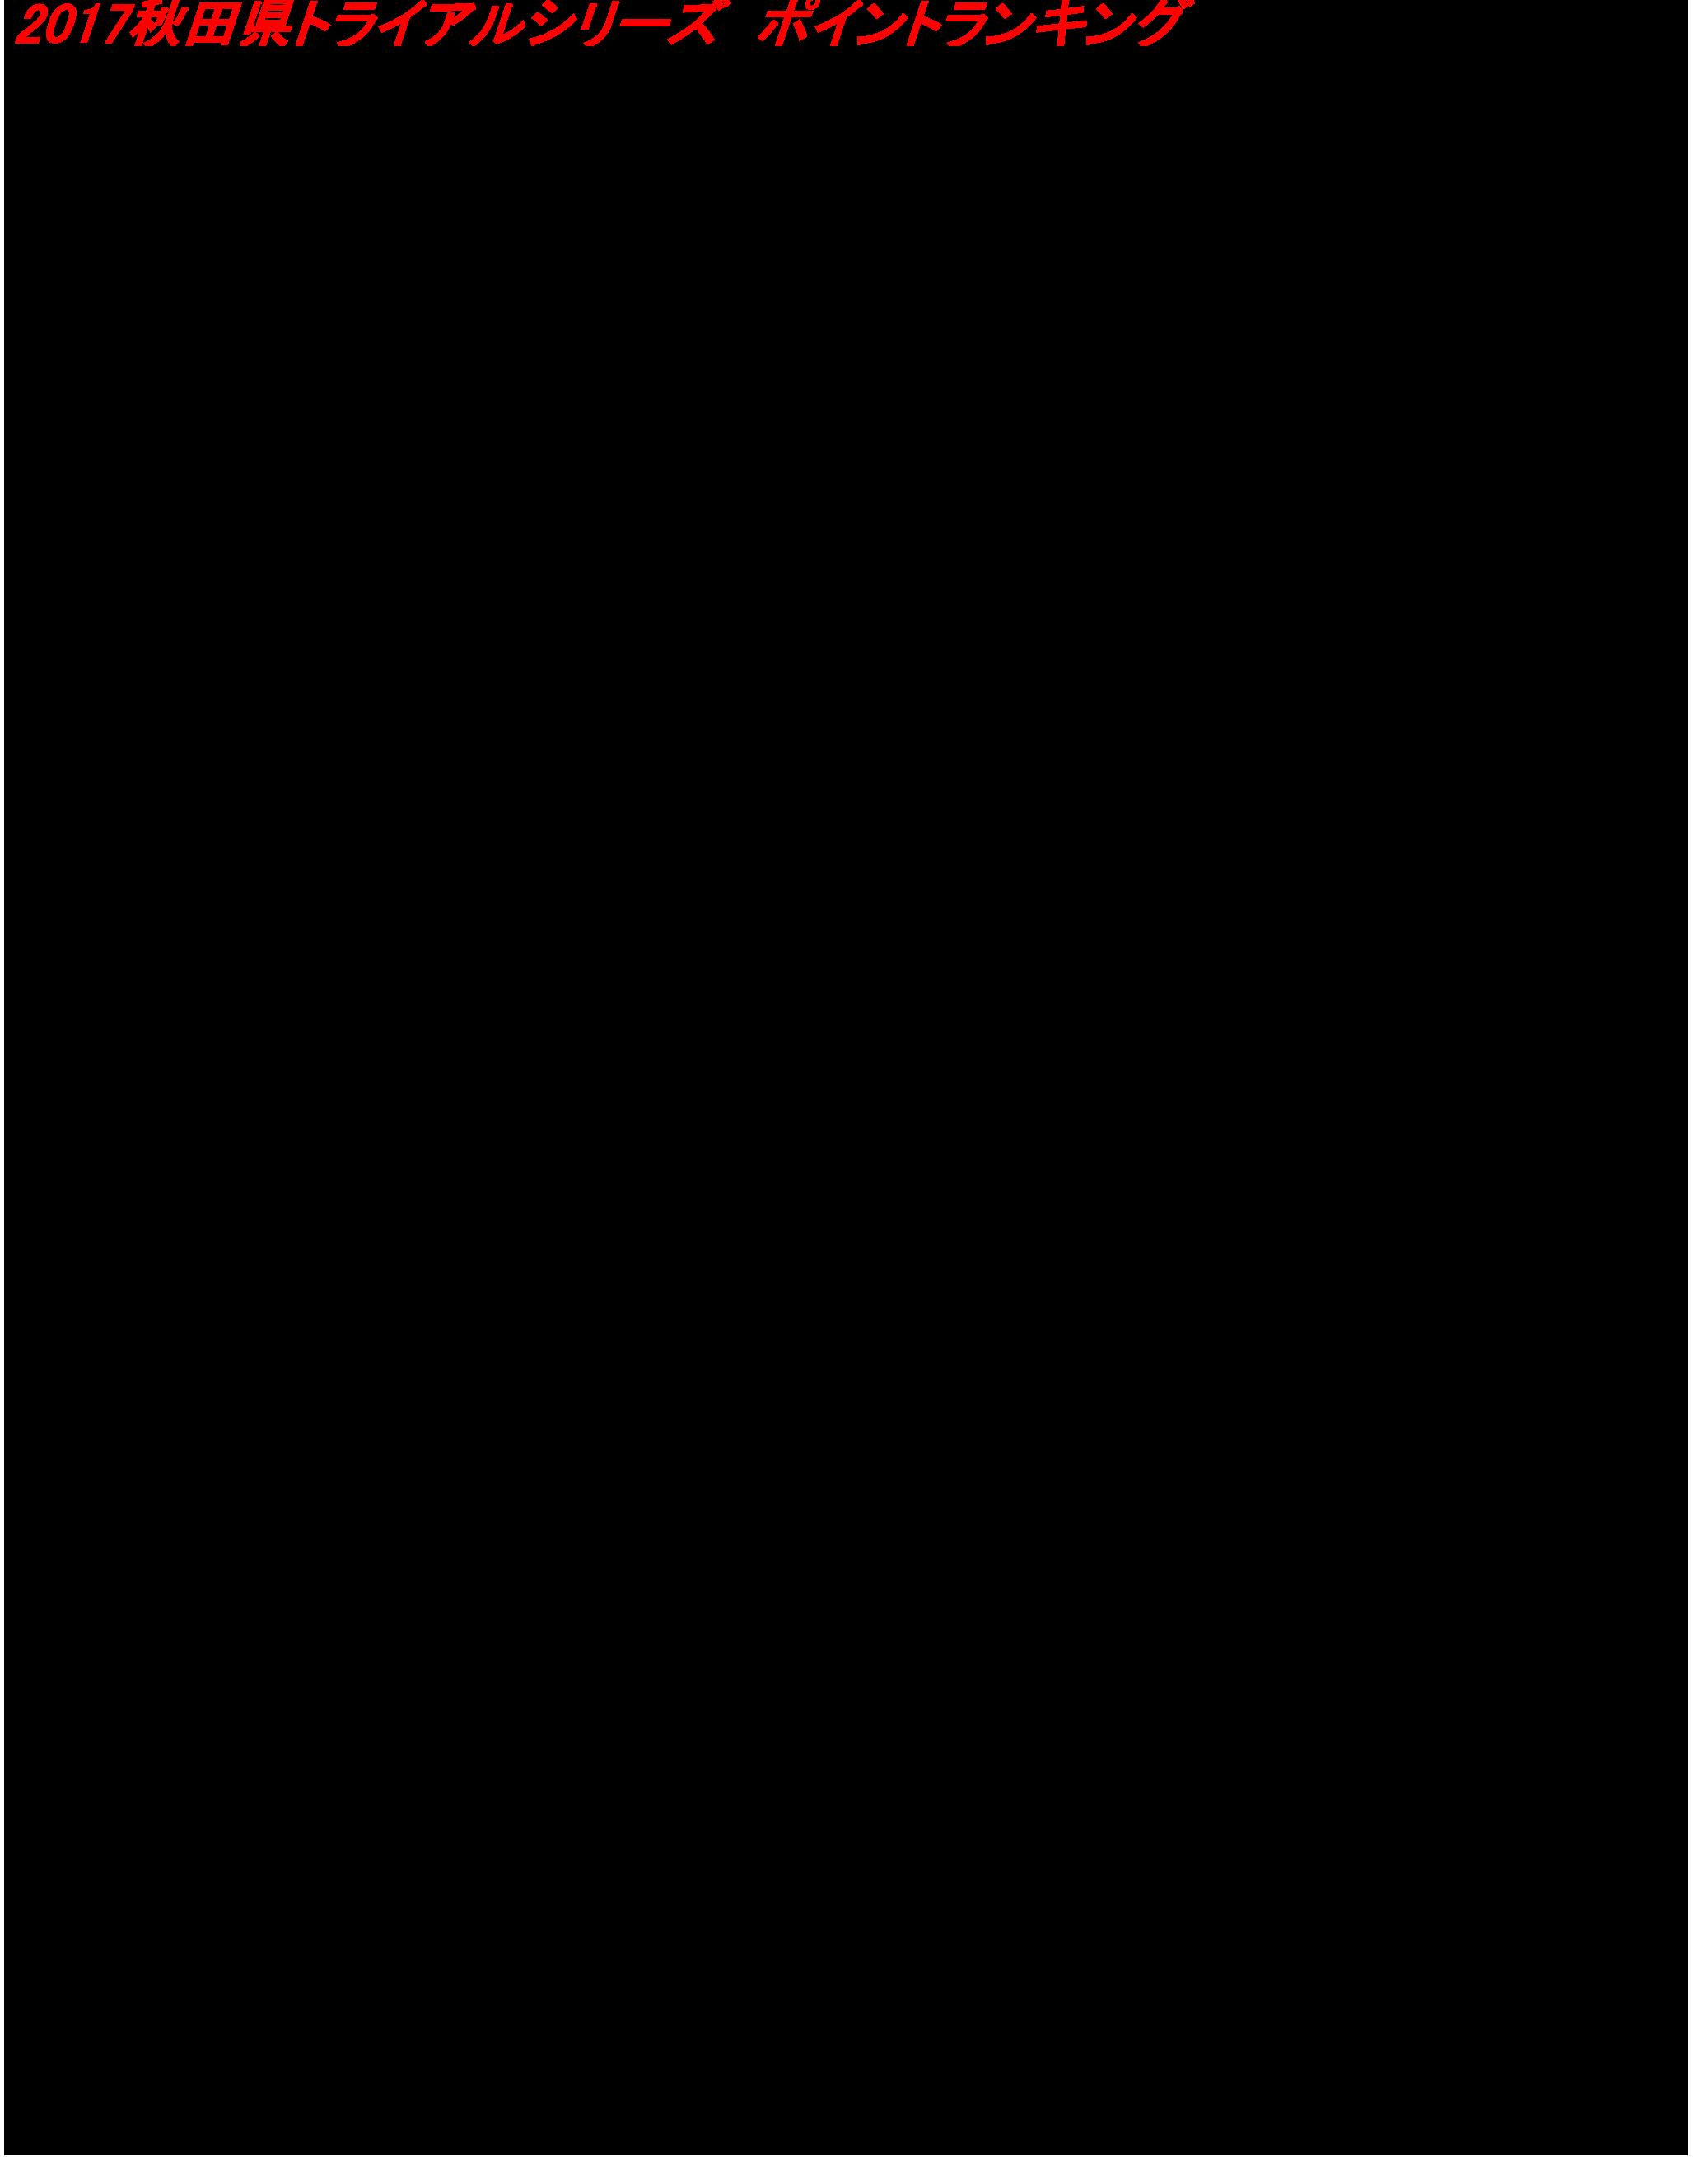 R1_0416